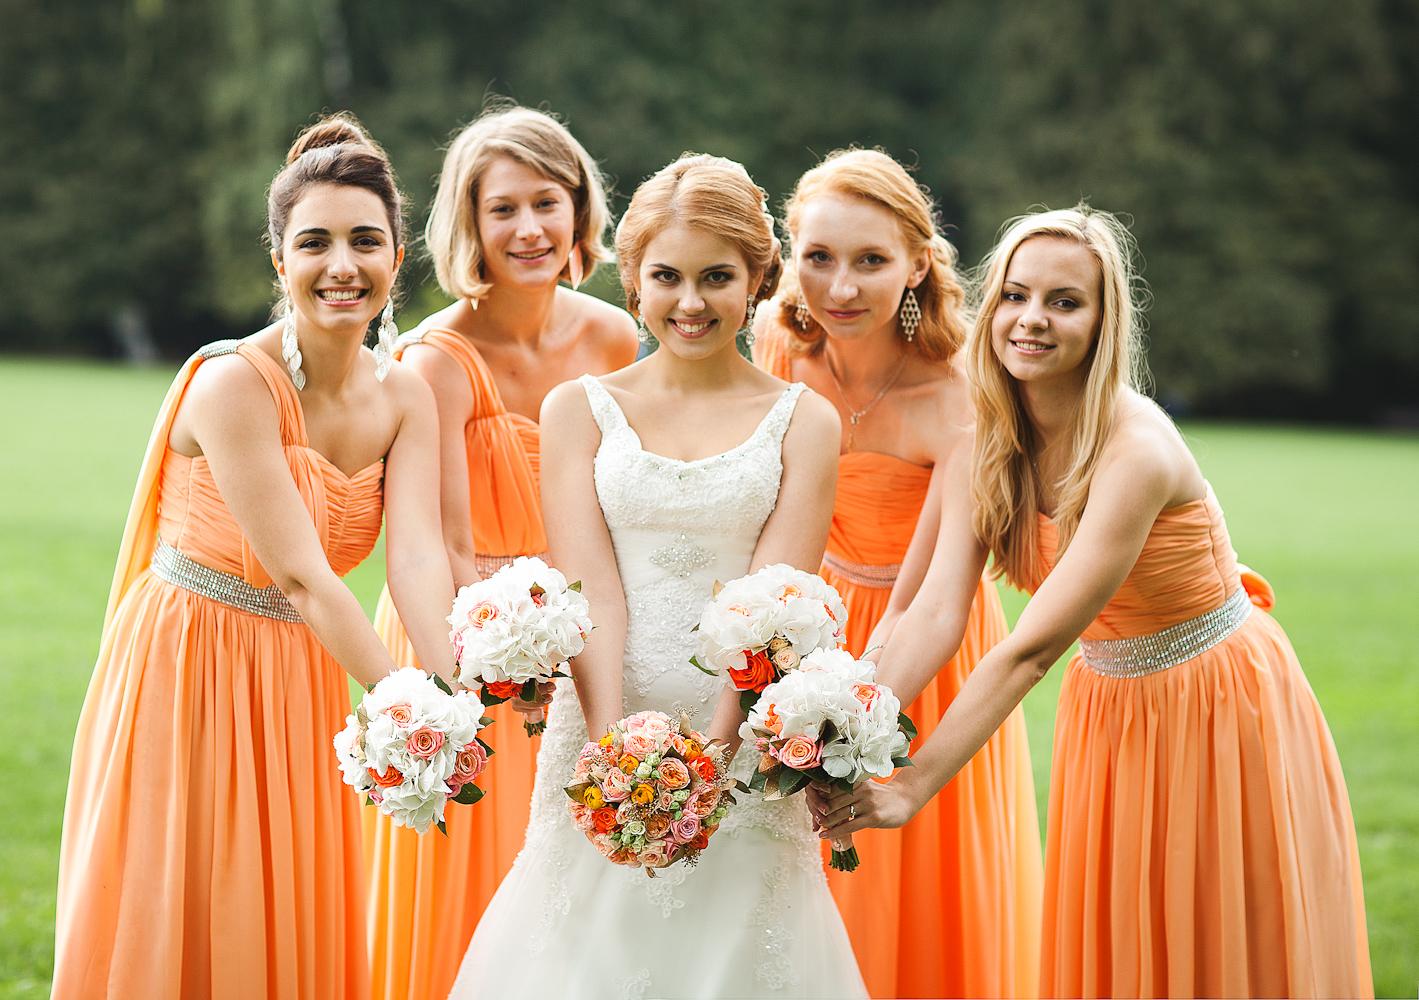 Прически подружек на свадьбе